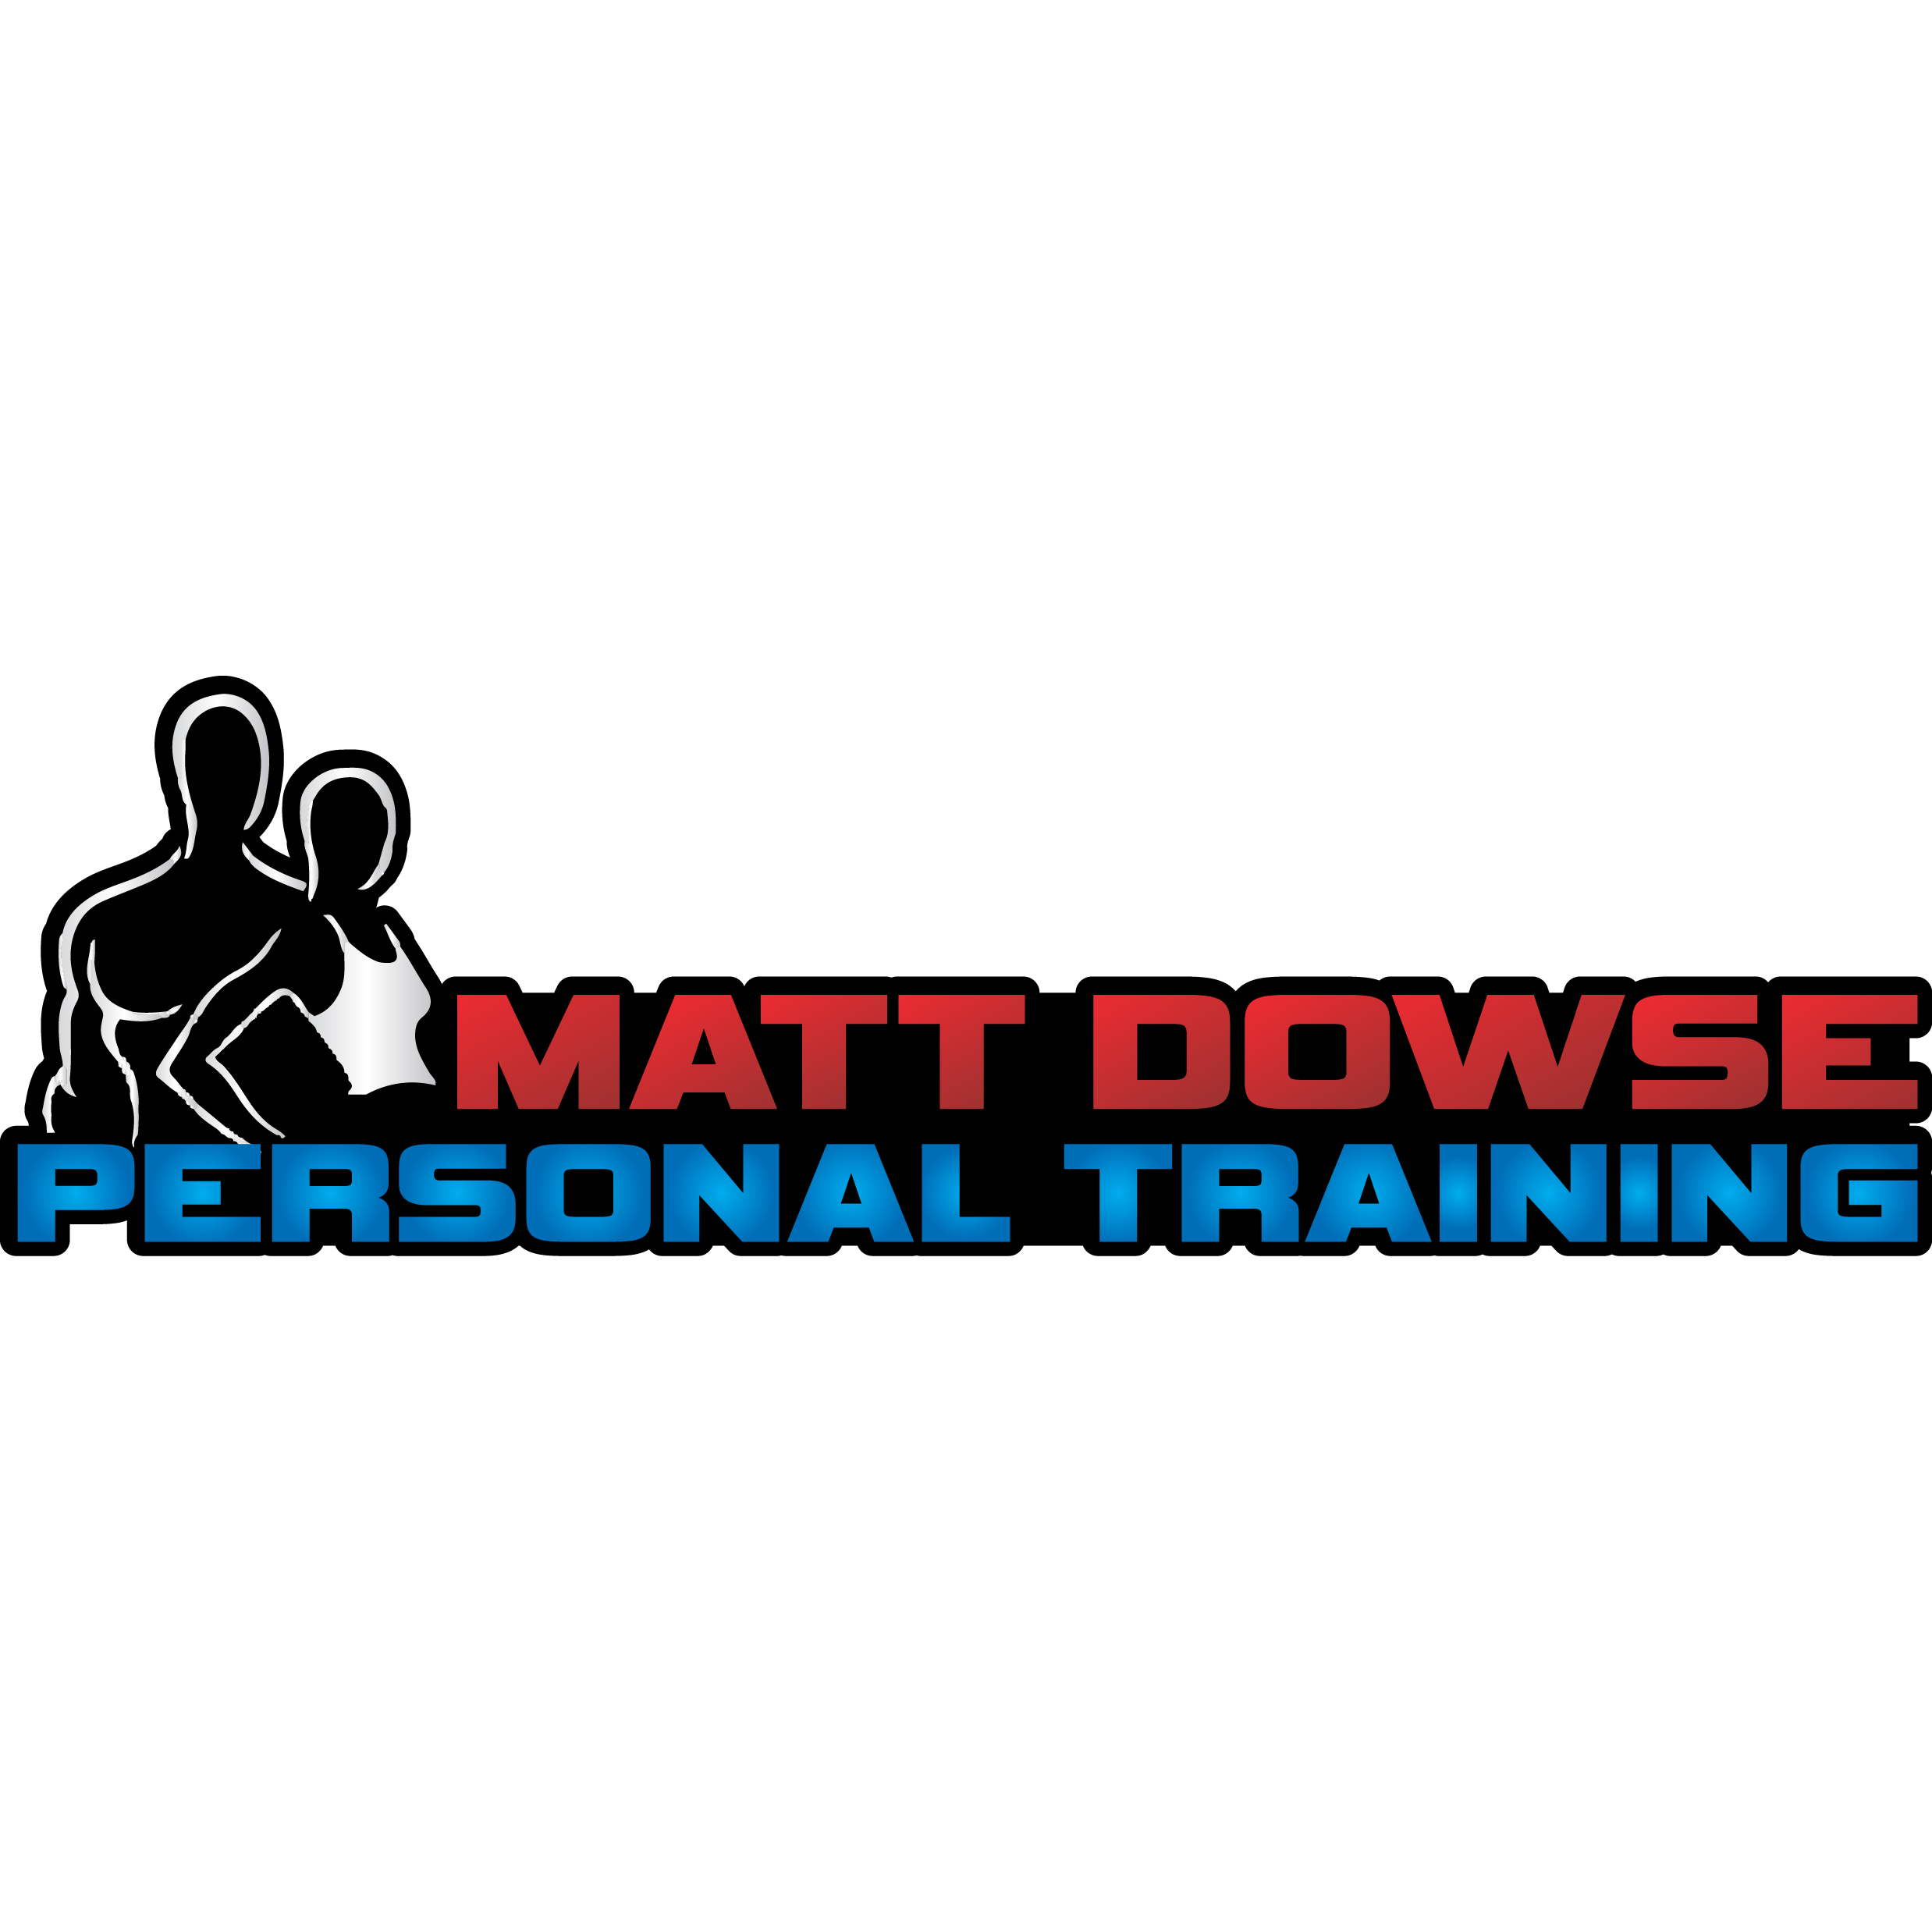 Matt Dowse Personal Training - London, London SW18 4FT - 07768 871147 | ShowMeLocal.com